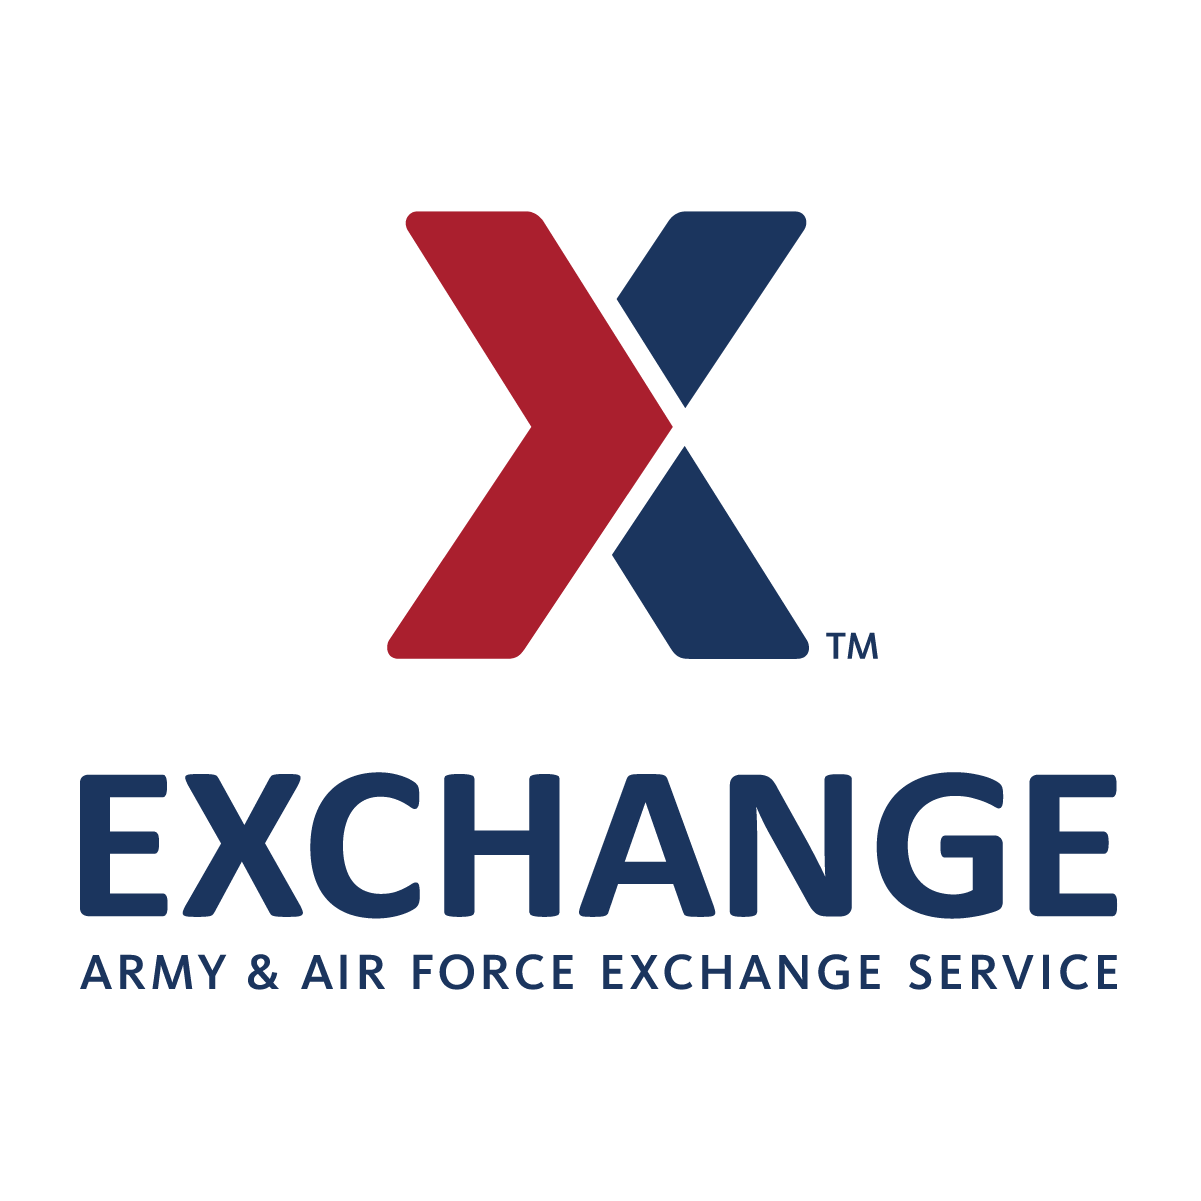 EXchange_logo_copy-01.png